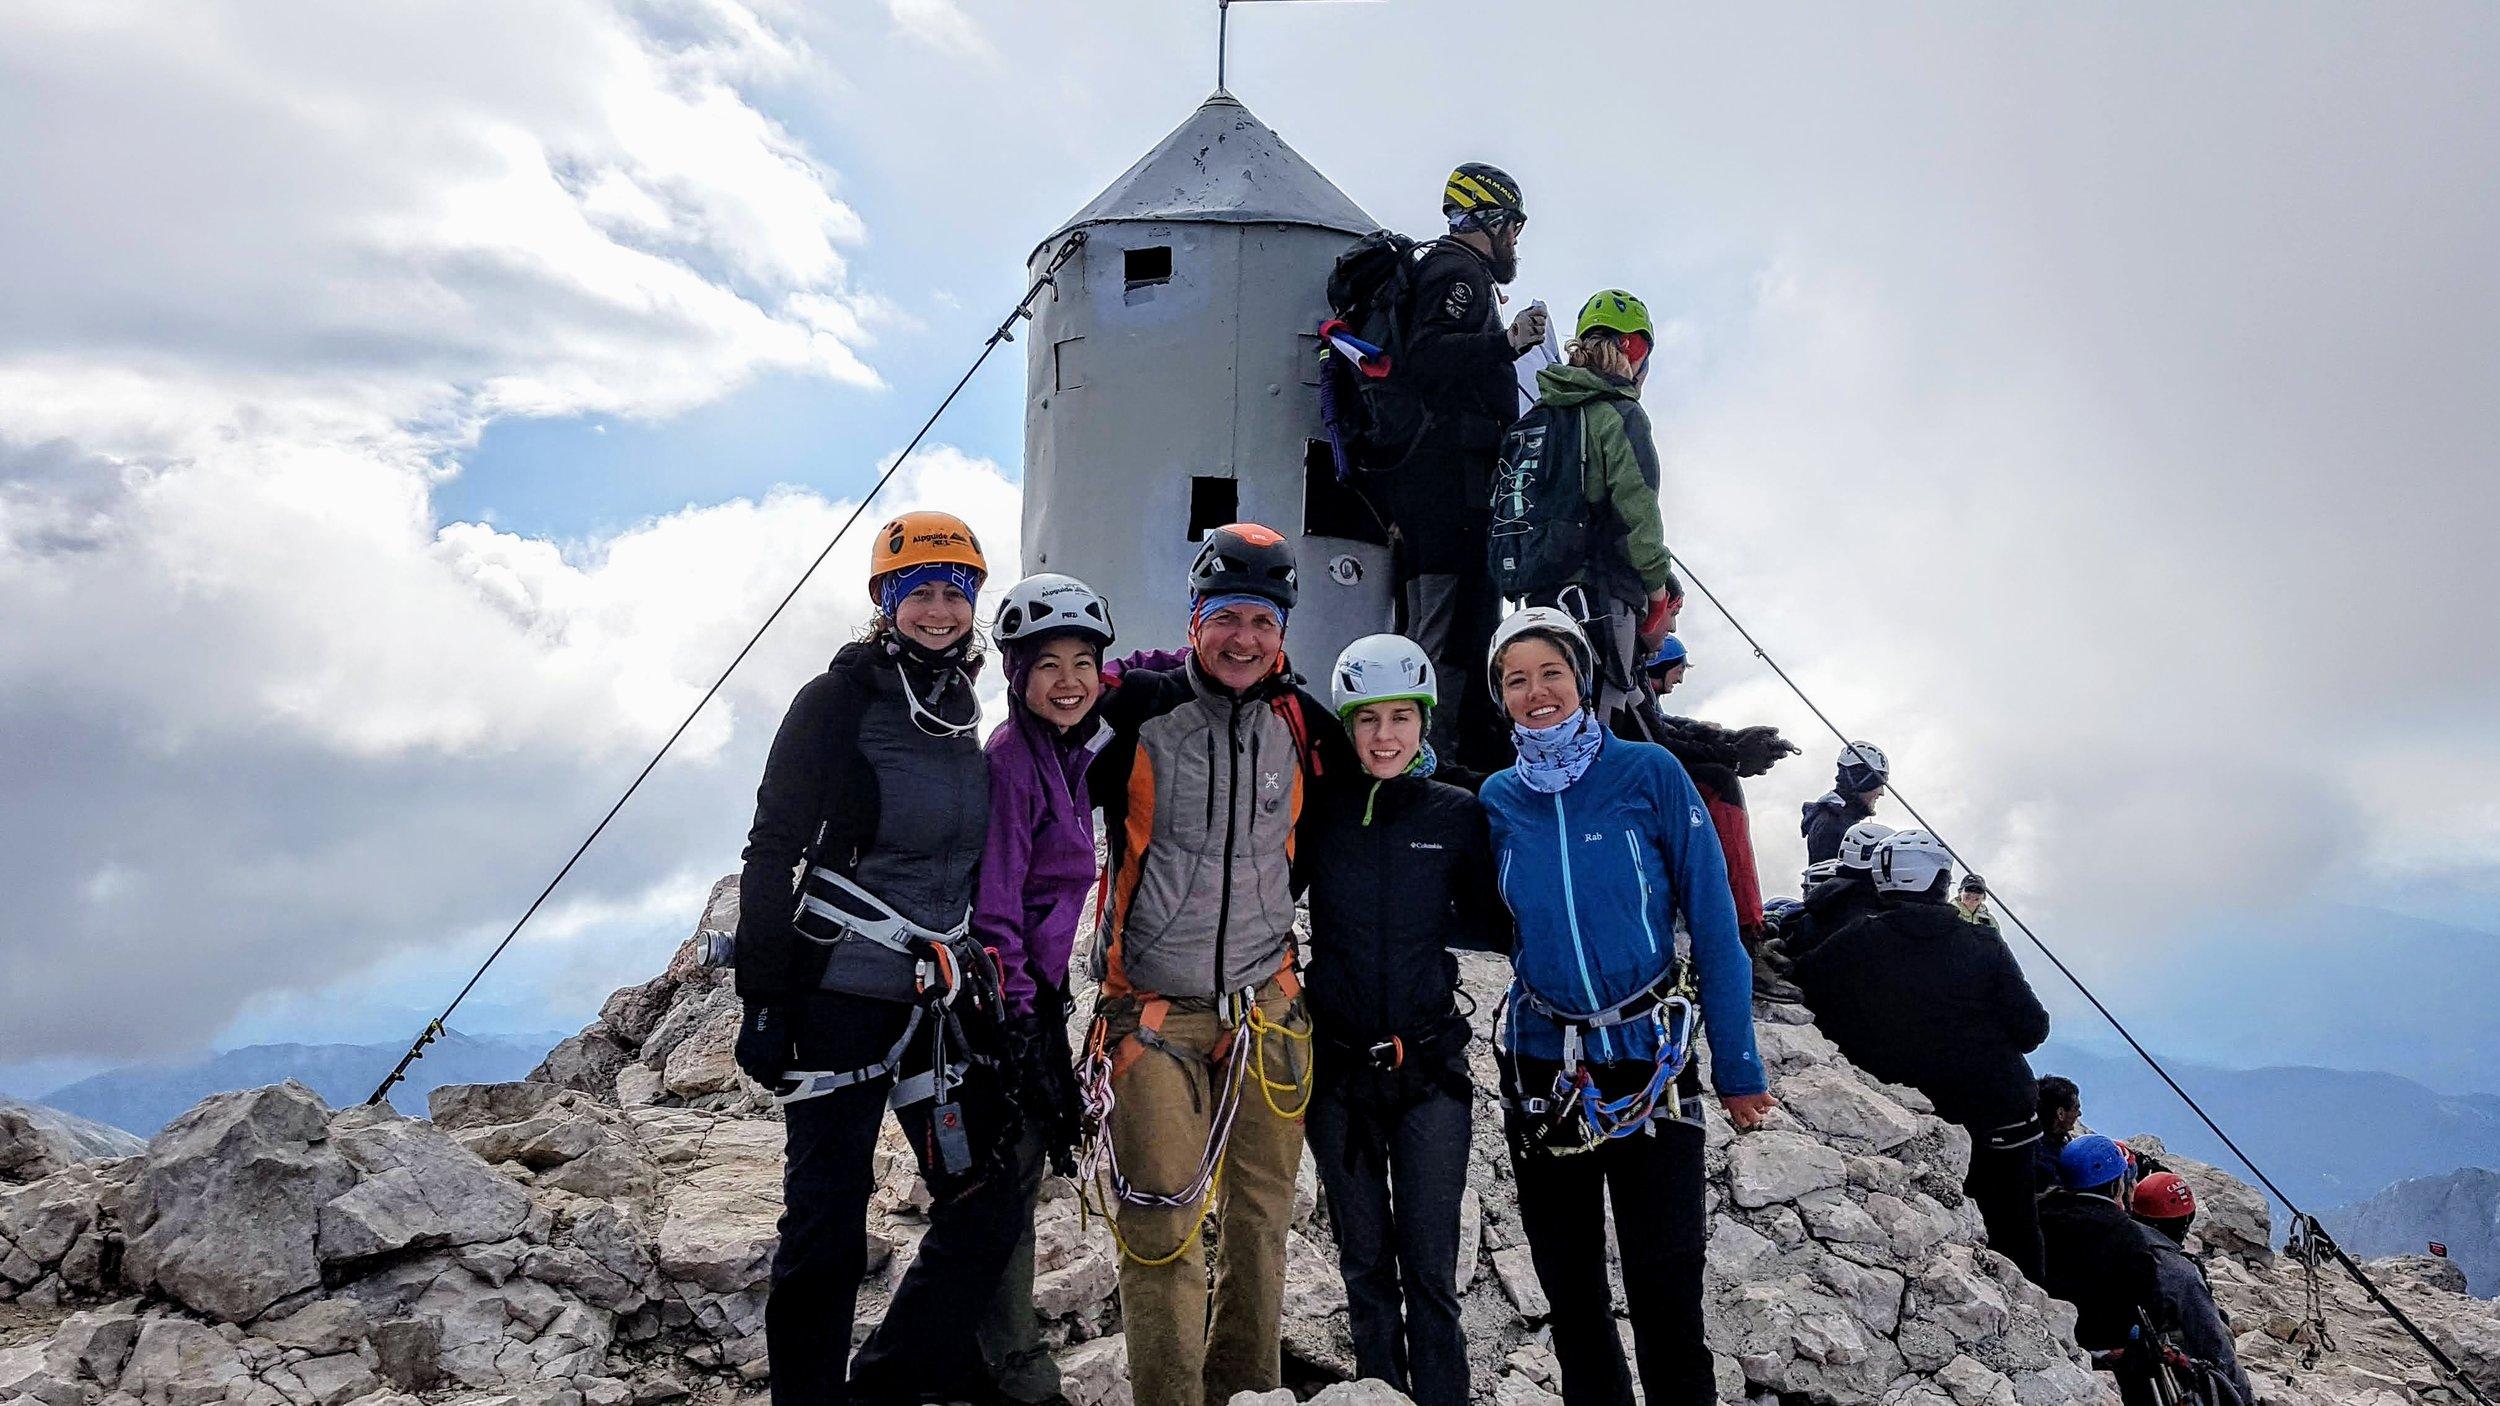 On the top of Triglav 2864 m